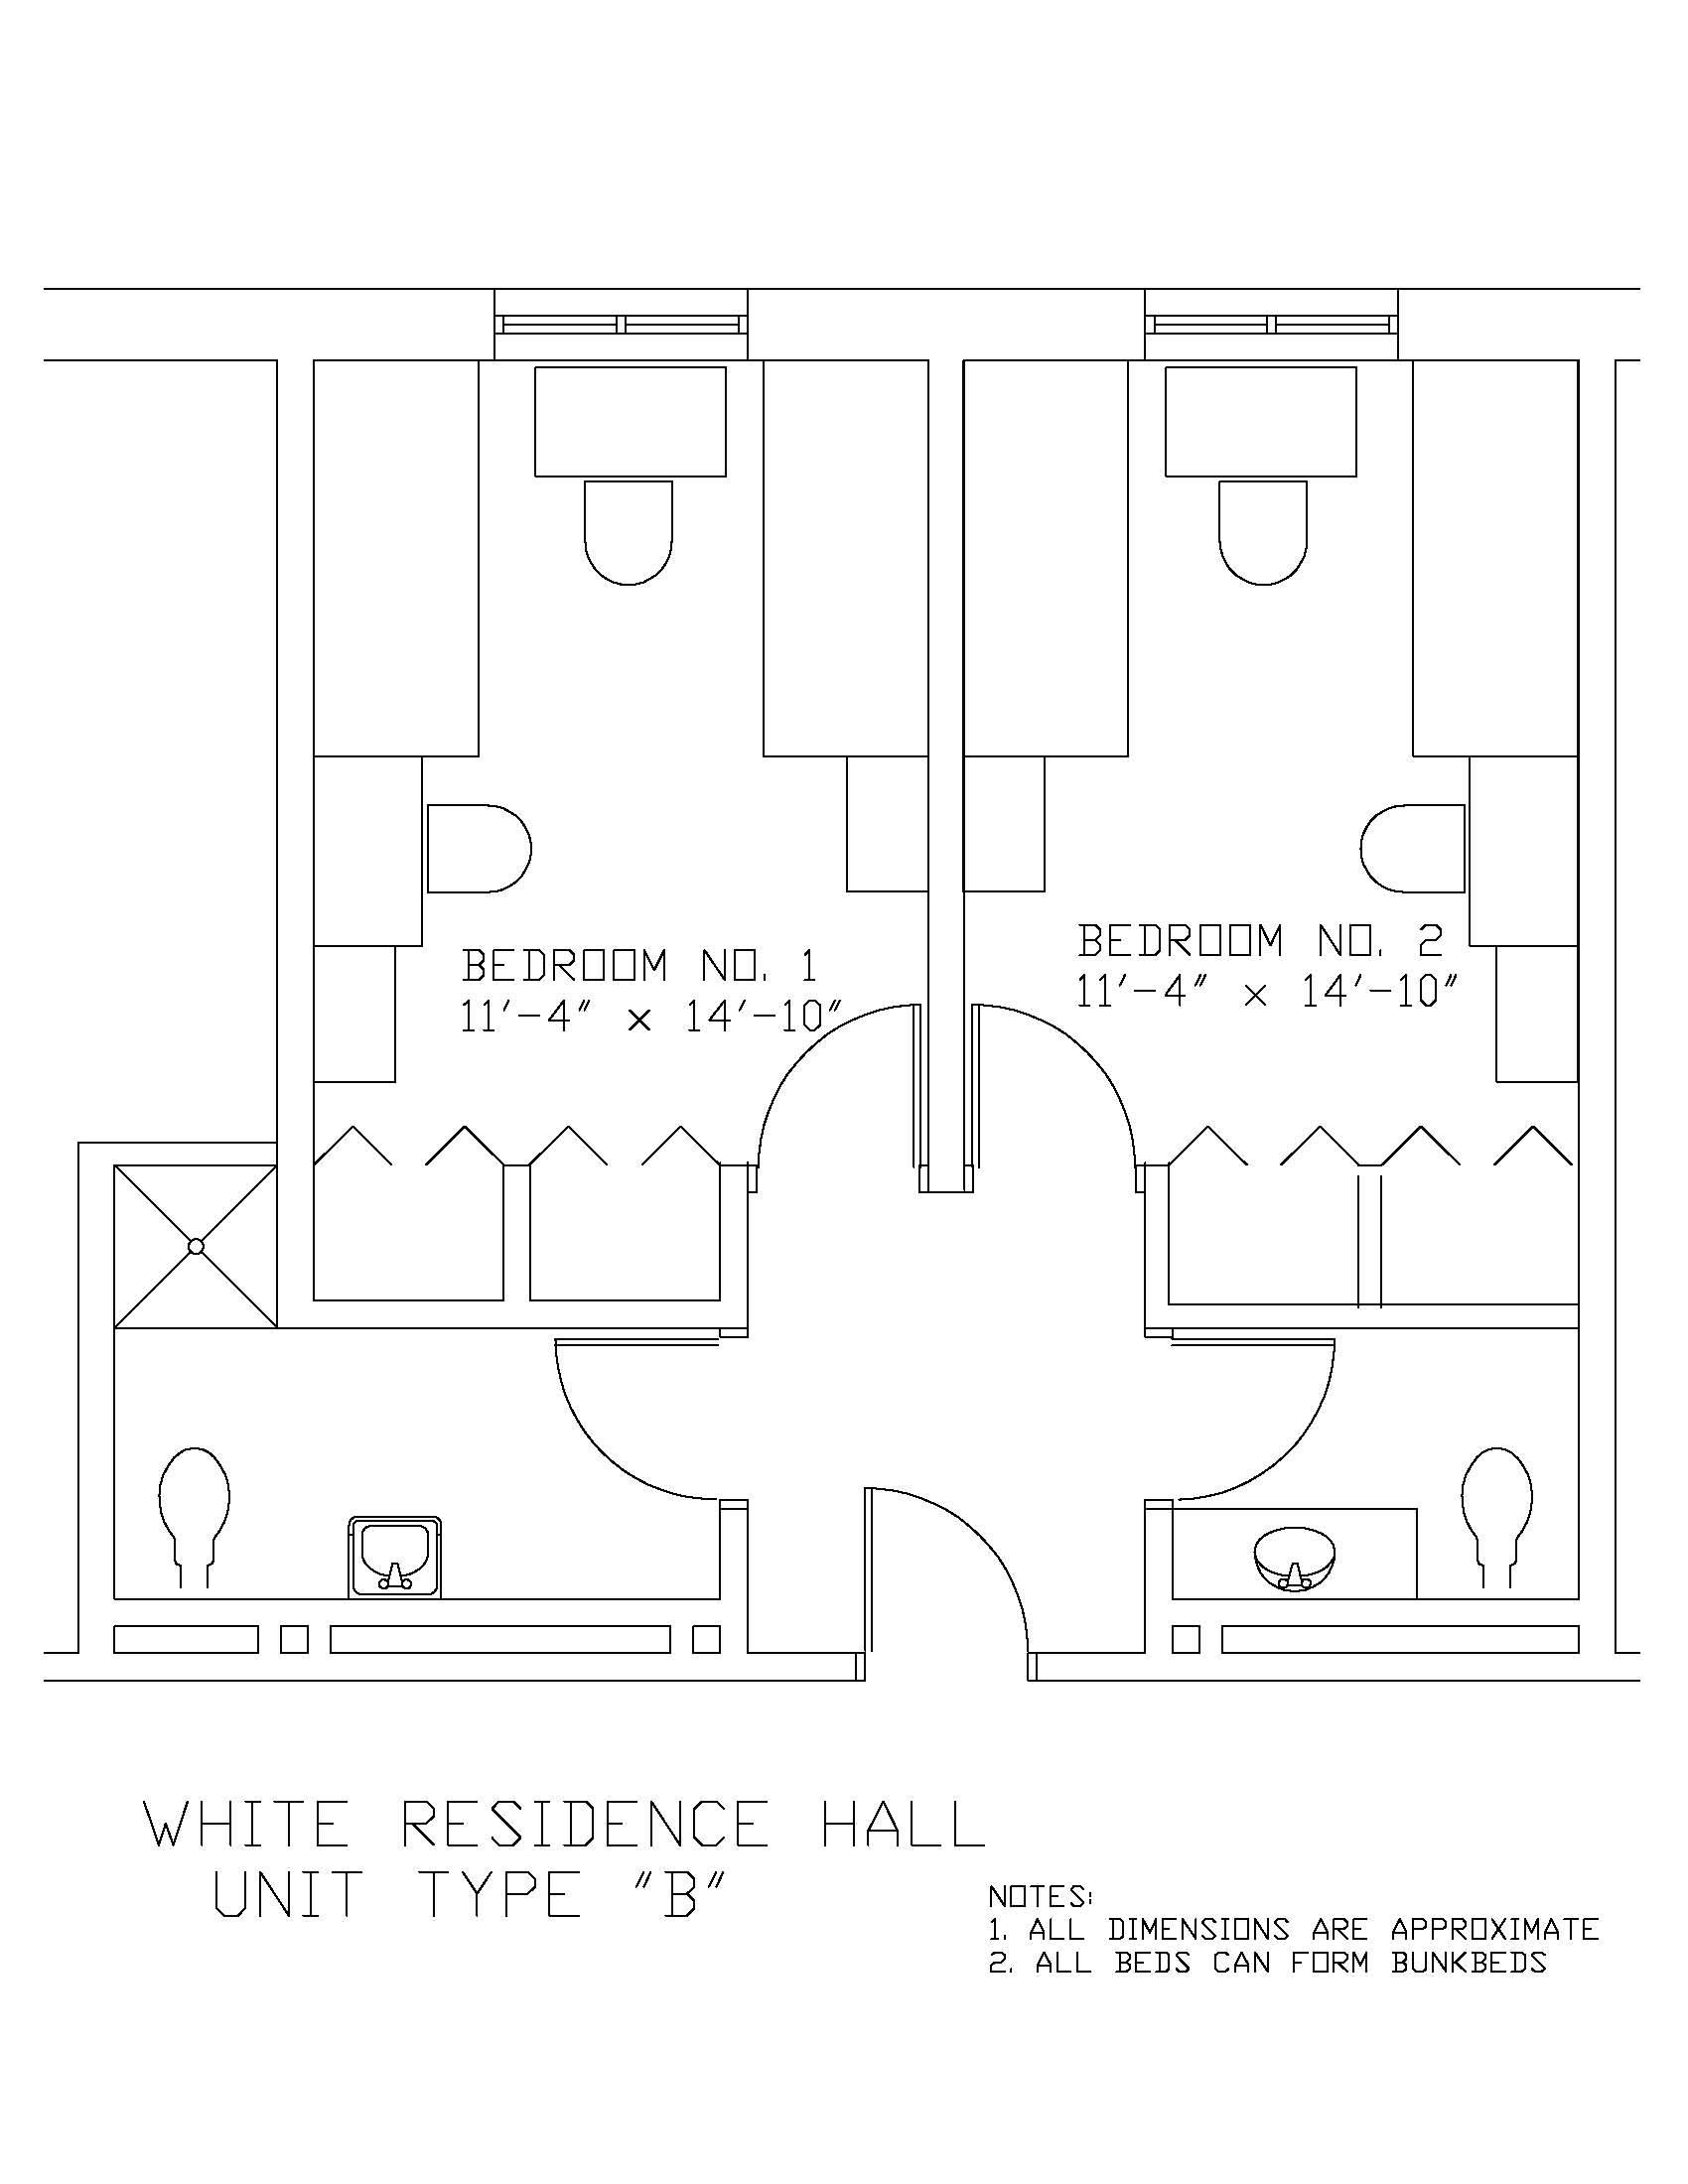 James S. White Hall: Type B